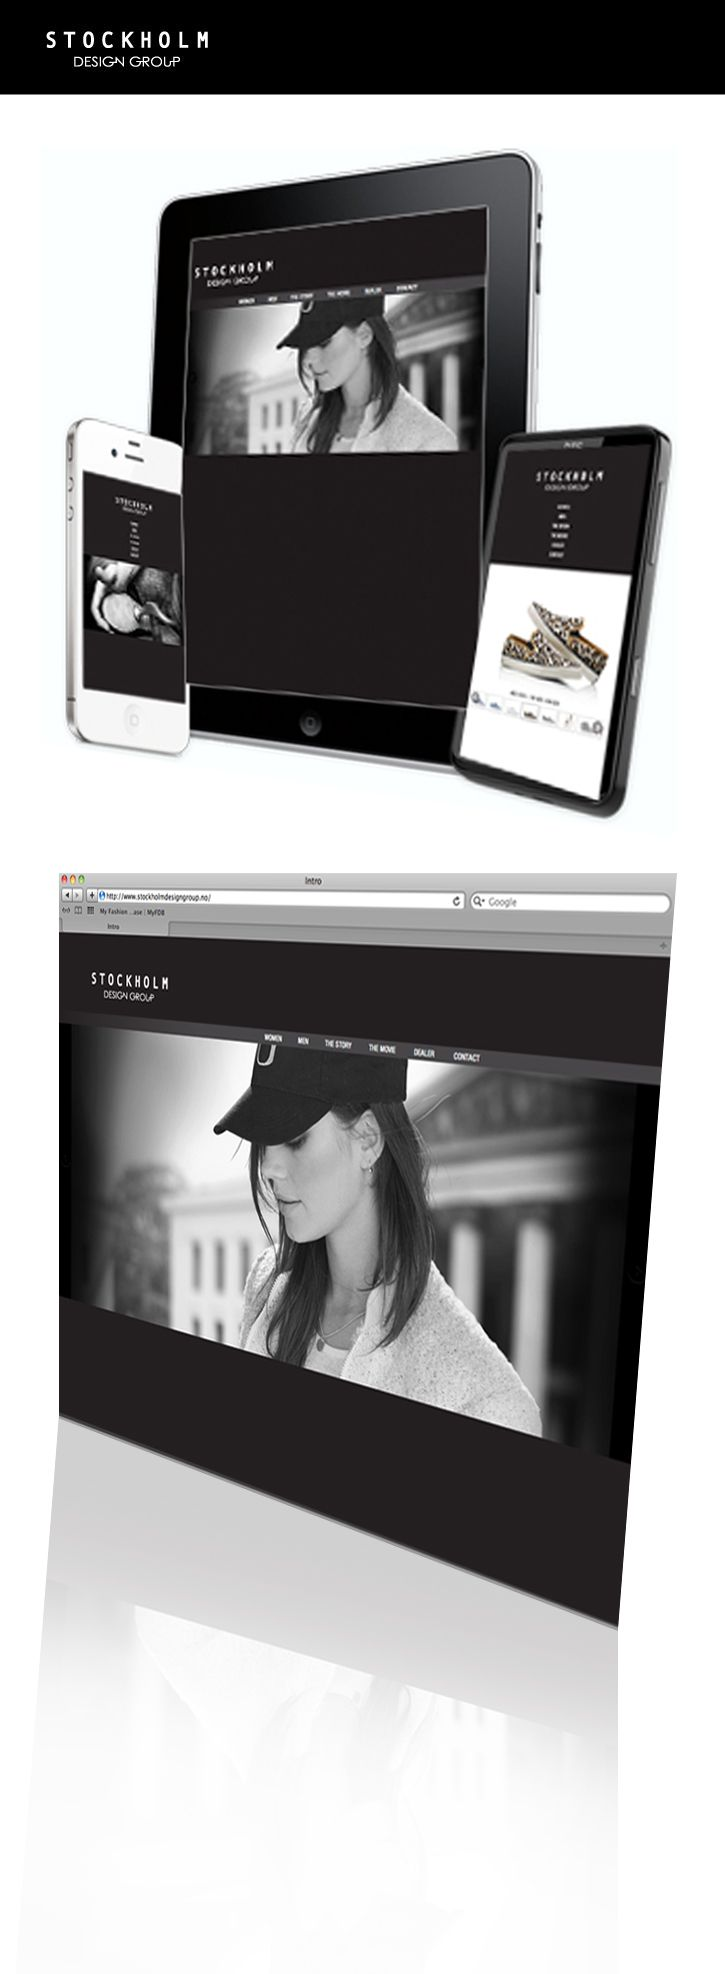 Webdesign  > www.stockholmdesigngroup.no